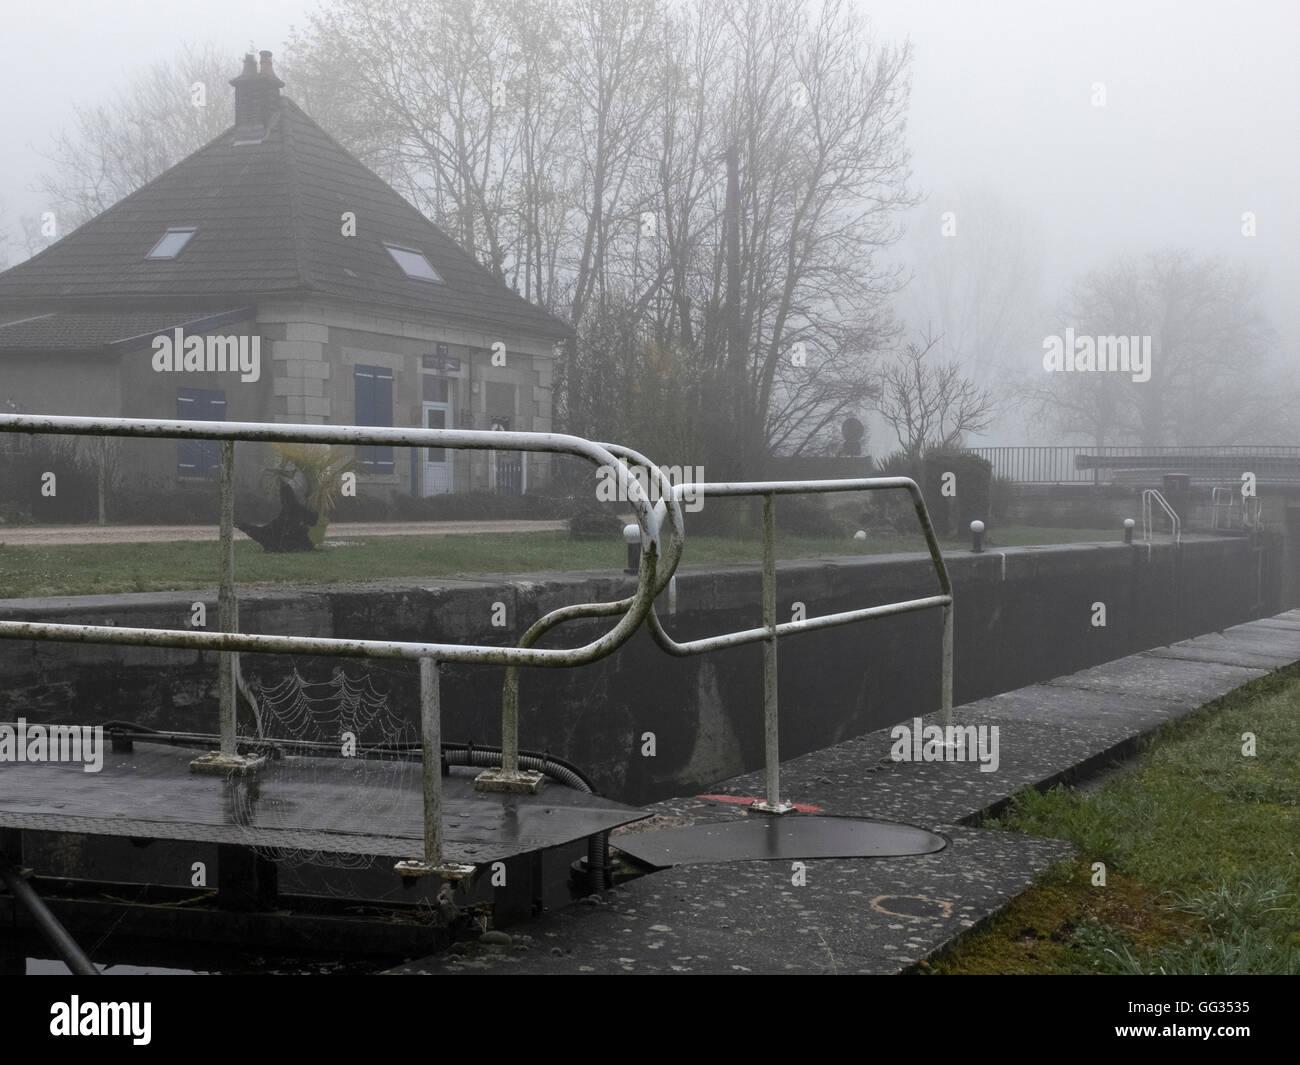 Fog, Saint-Usage, Canal de Bourgogne, France - Stock Image